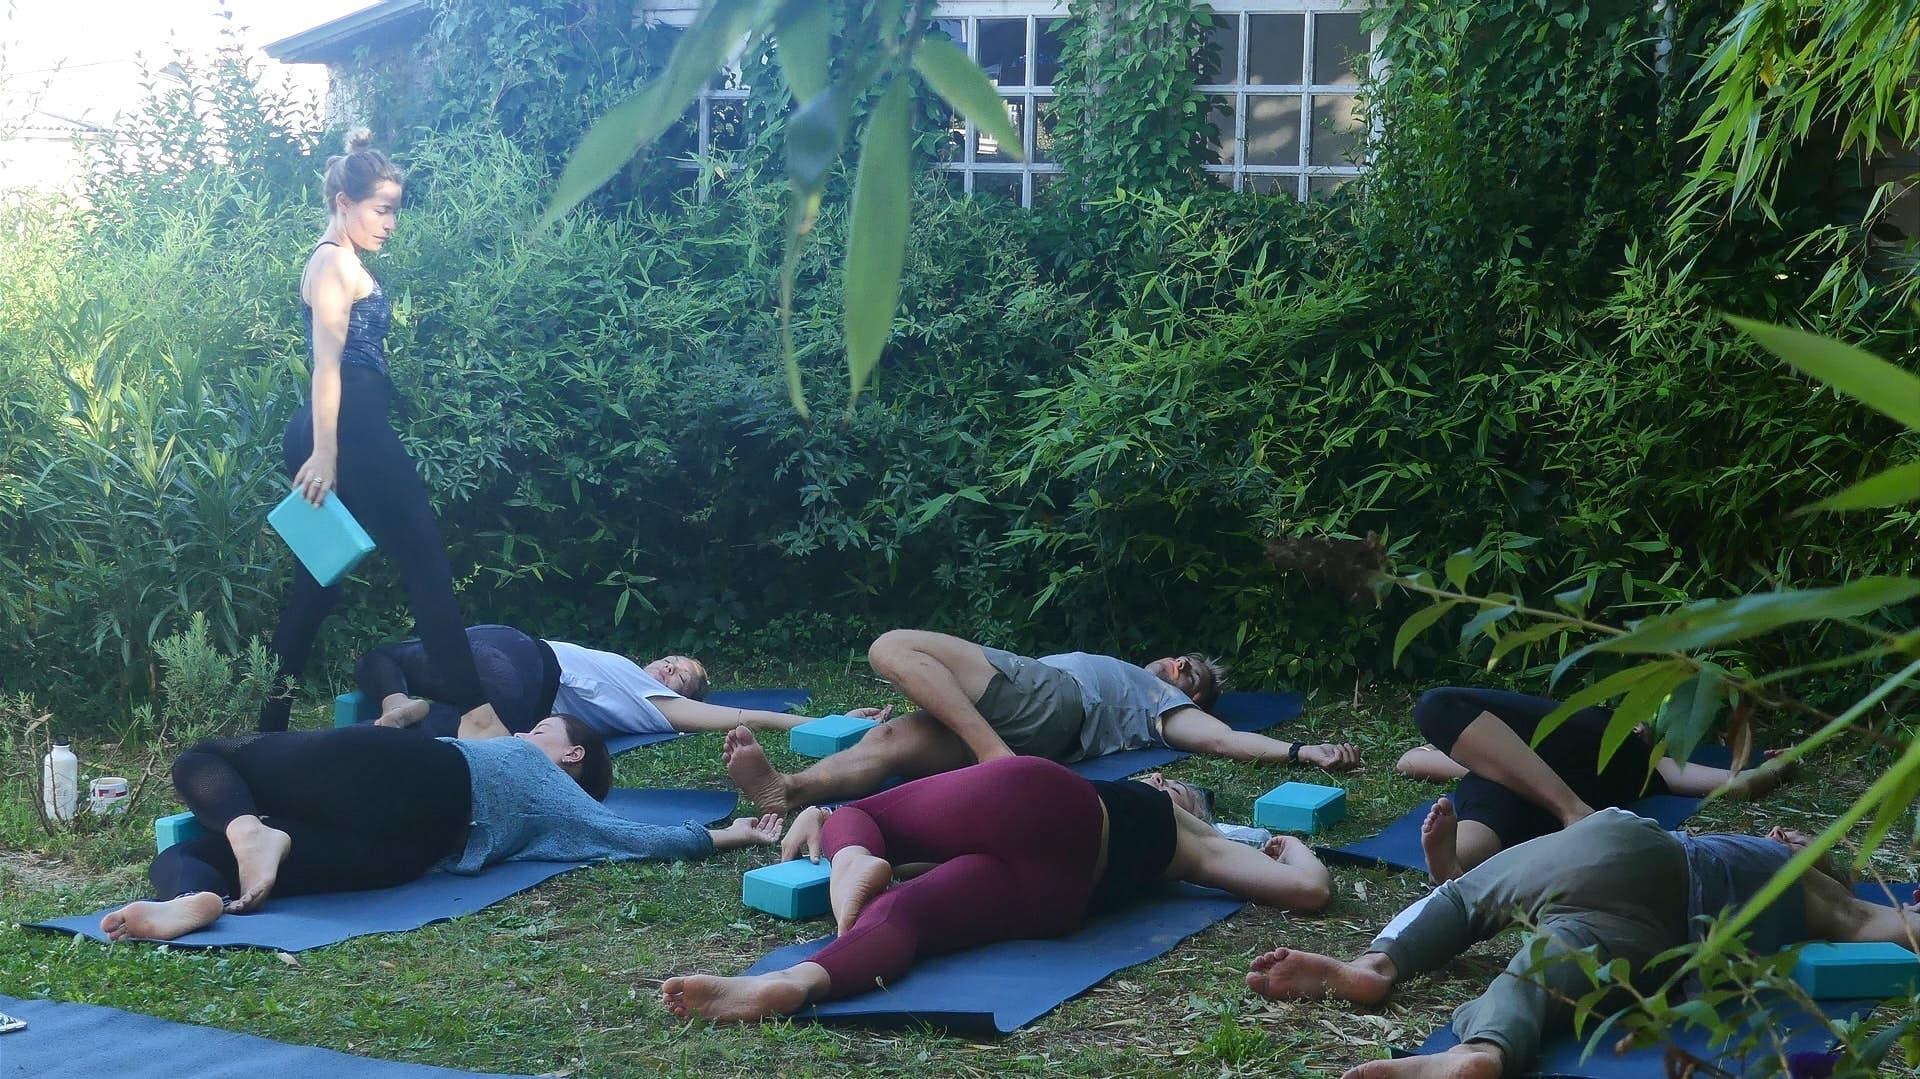 yoga class in the garden of nami house hostel